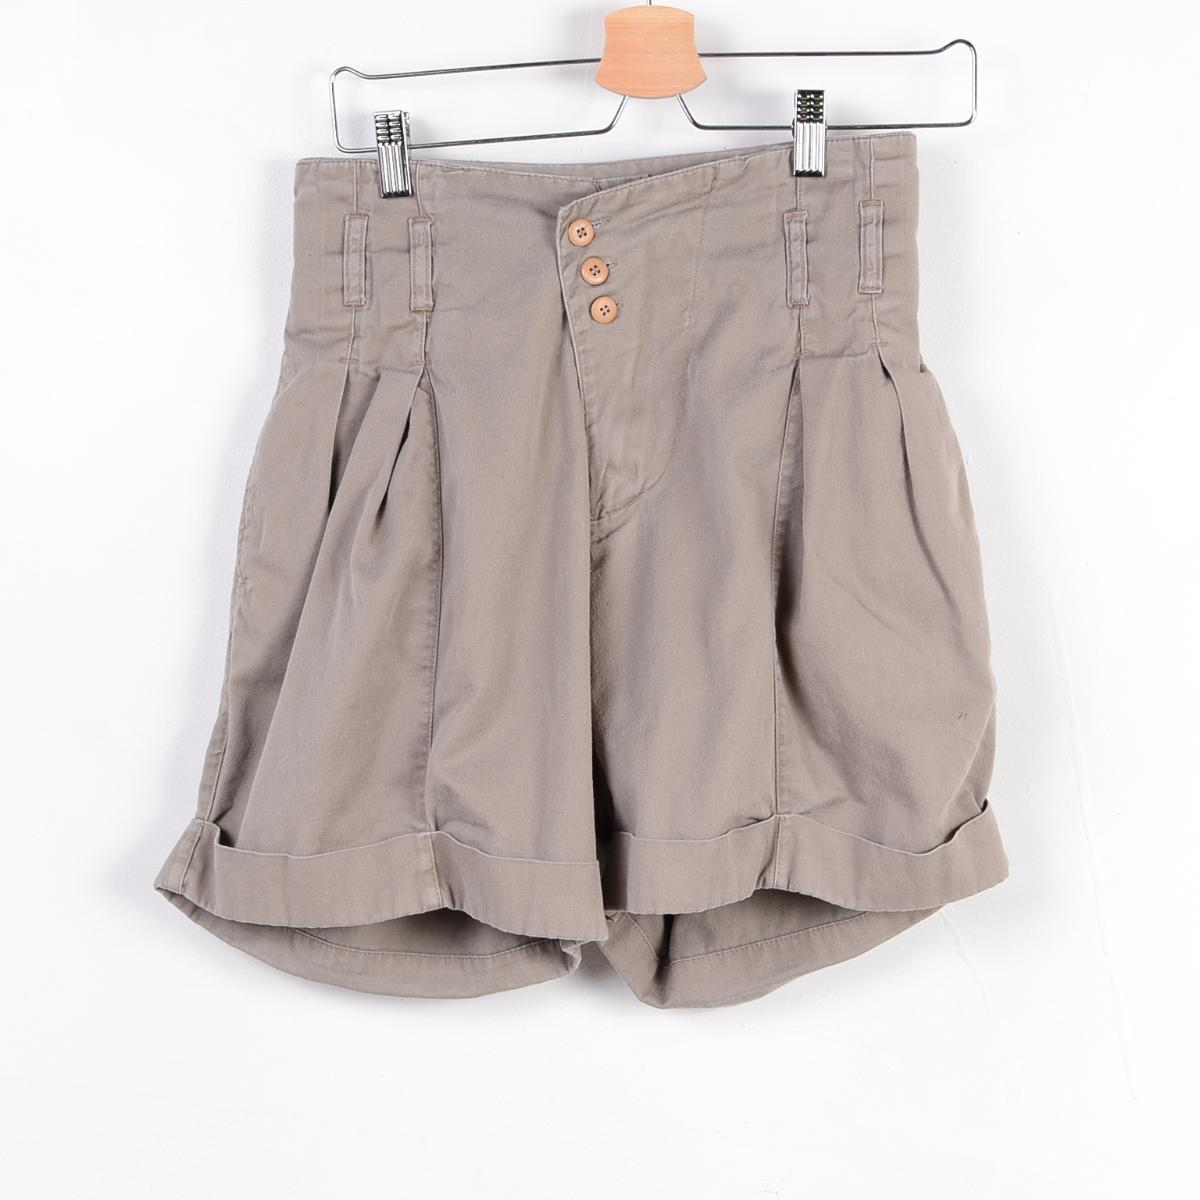 VINTAGE CLOTHING JAM TRADING | Rakuten Global Market: High-waisted ...